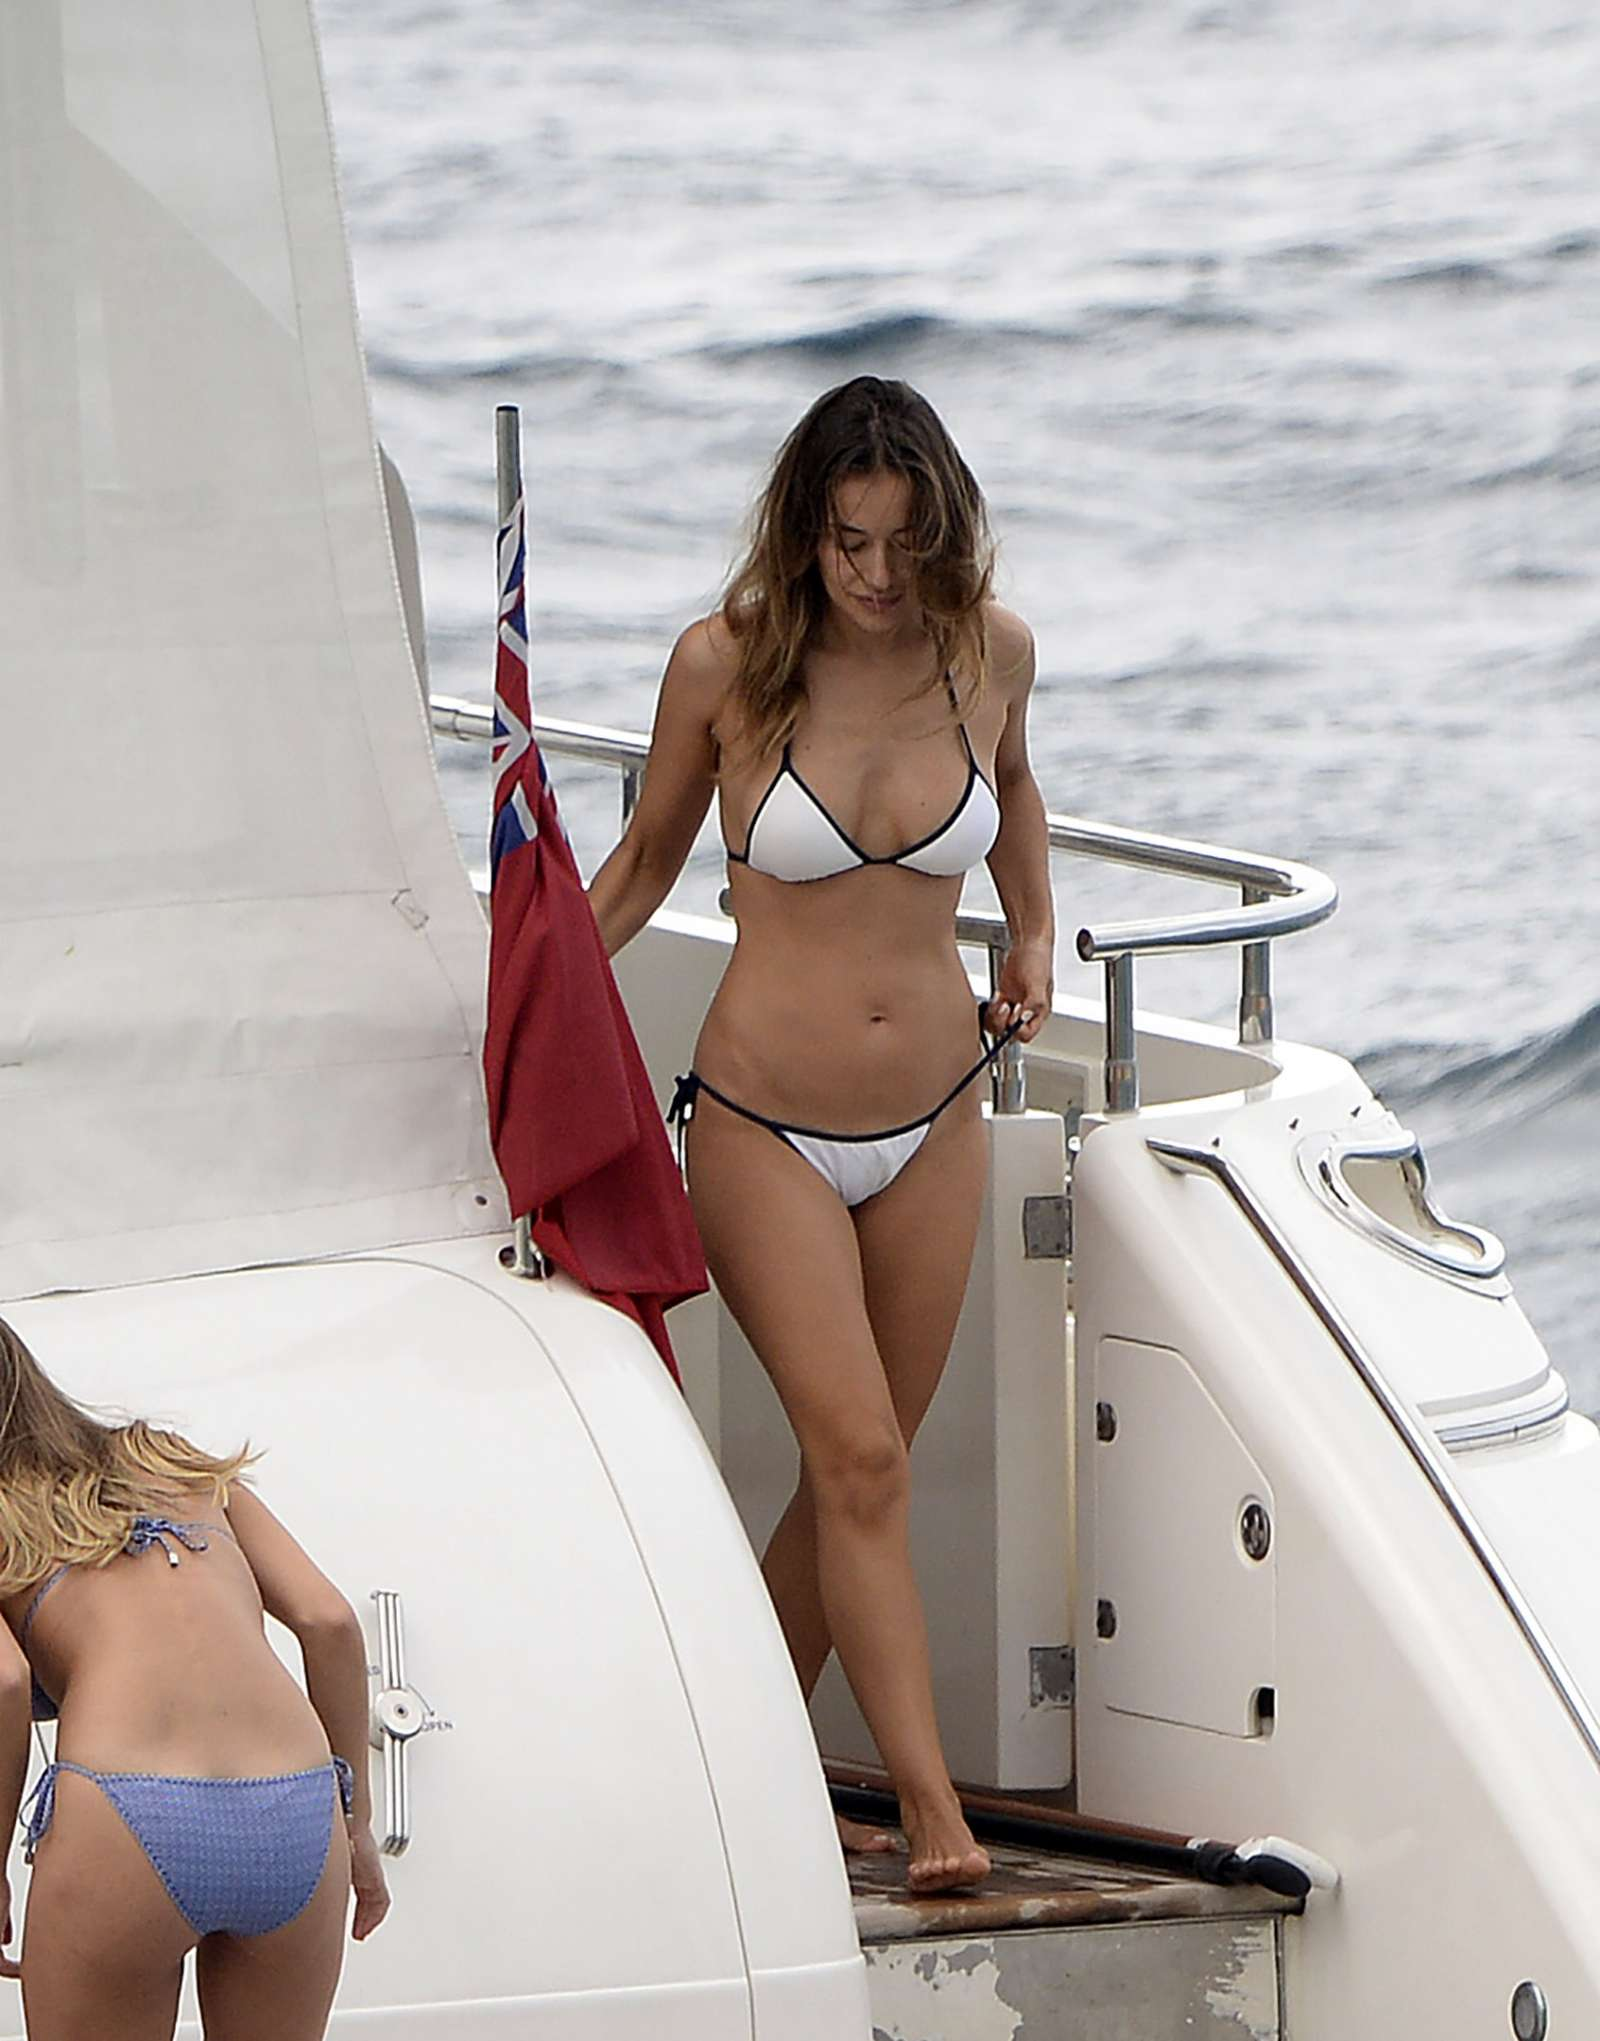 Ann-Kathrin Brommel 2018 : Ann-Kathrin Brommel and Anna Sharypova in Bikini 2018 -43